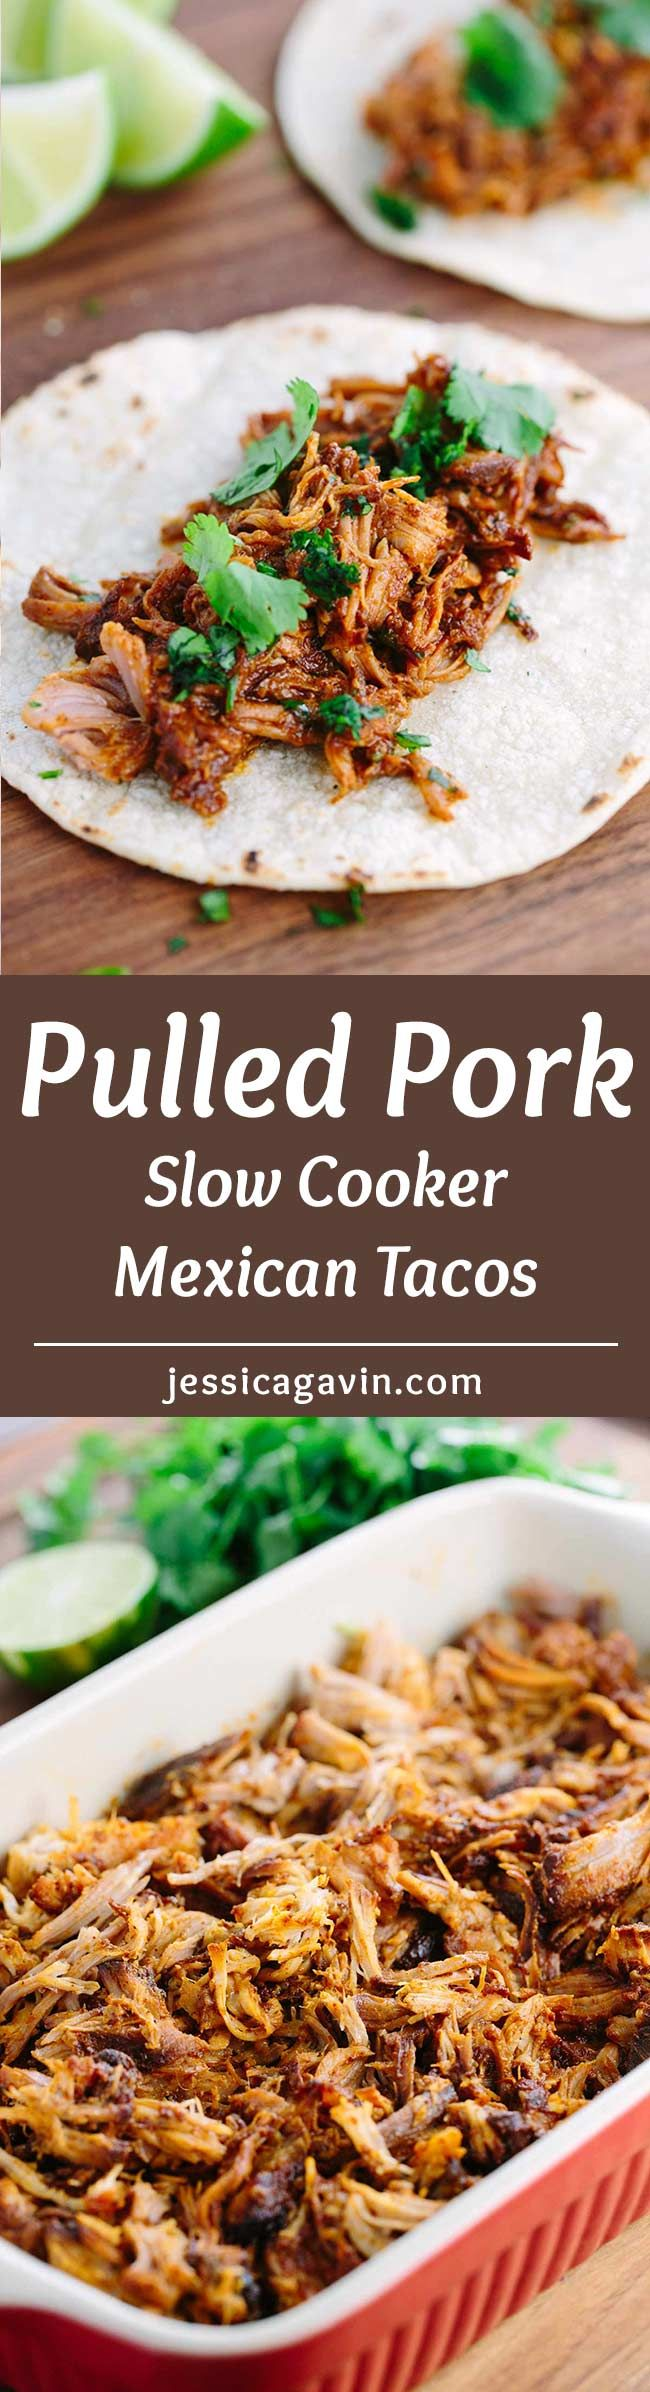 25+ Best Ideas about Mole Sauce on Pinterest | Mexican ...